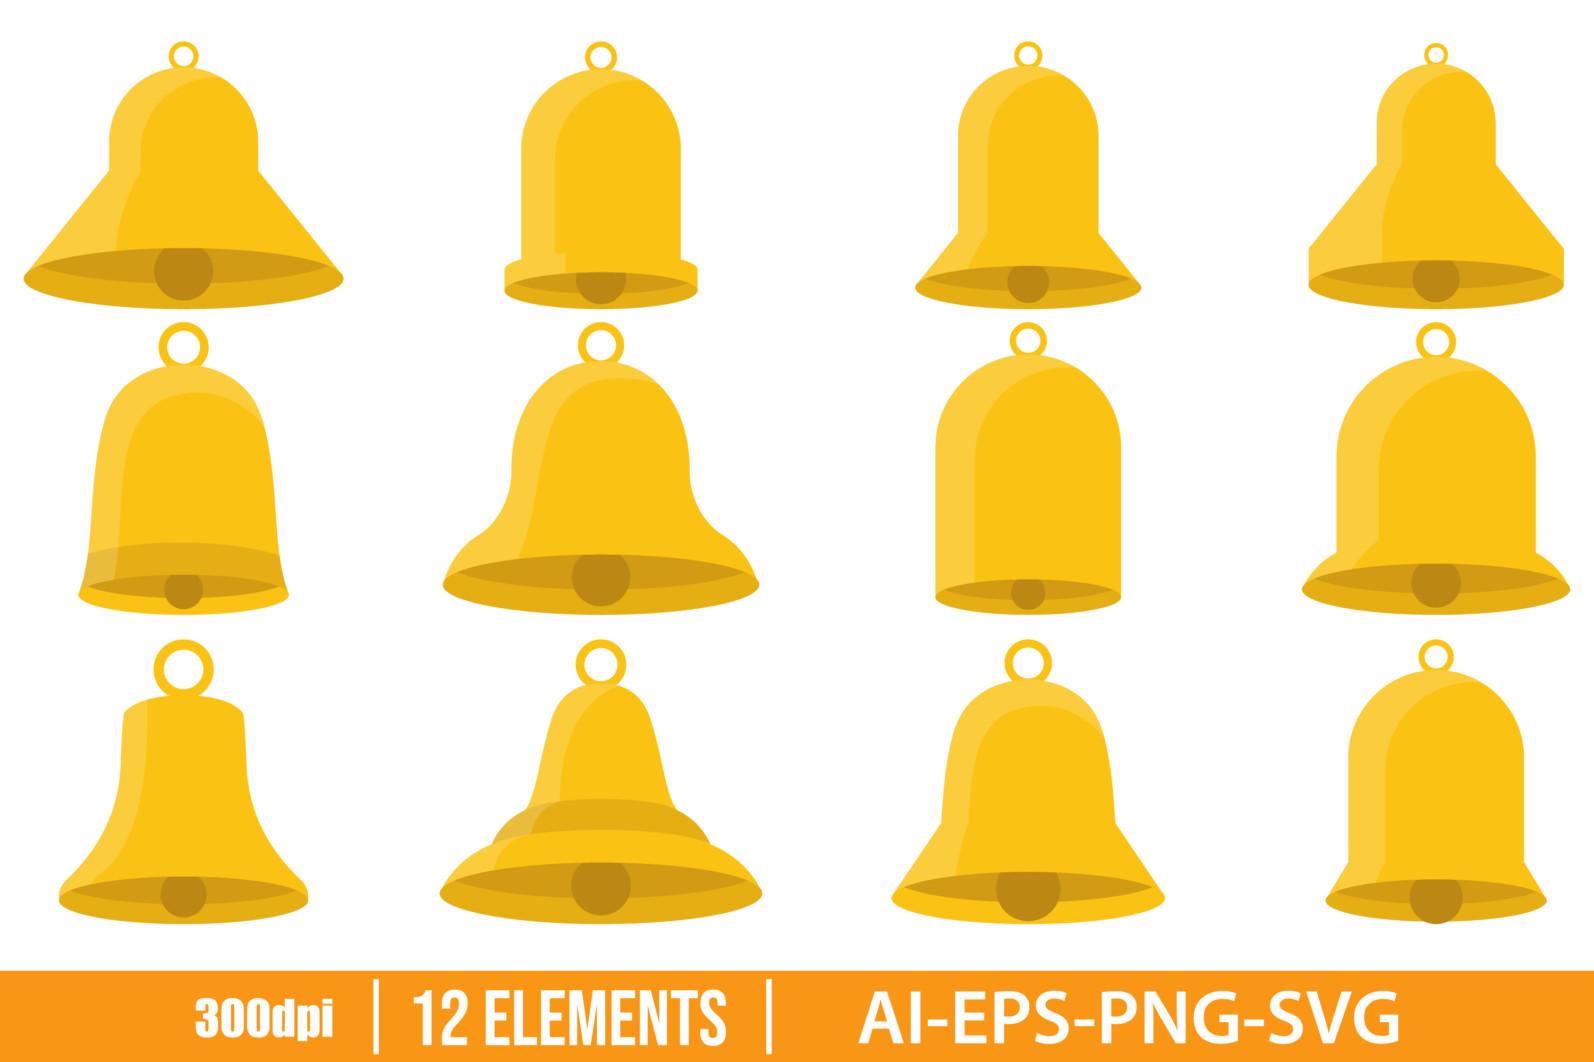 Golden bells clipart vector design illustration. Golden bell set. Vector Clipart Print - GOLDEN BELL scaled -